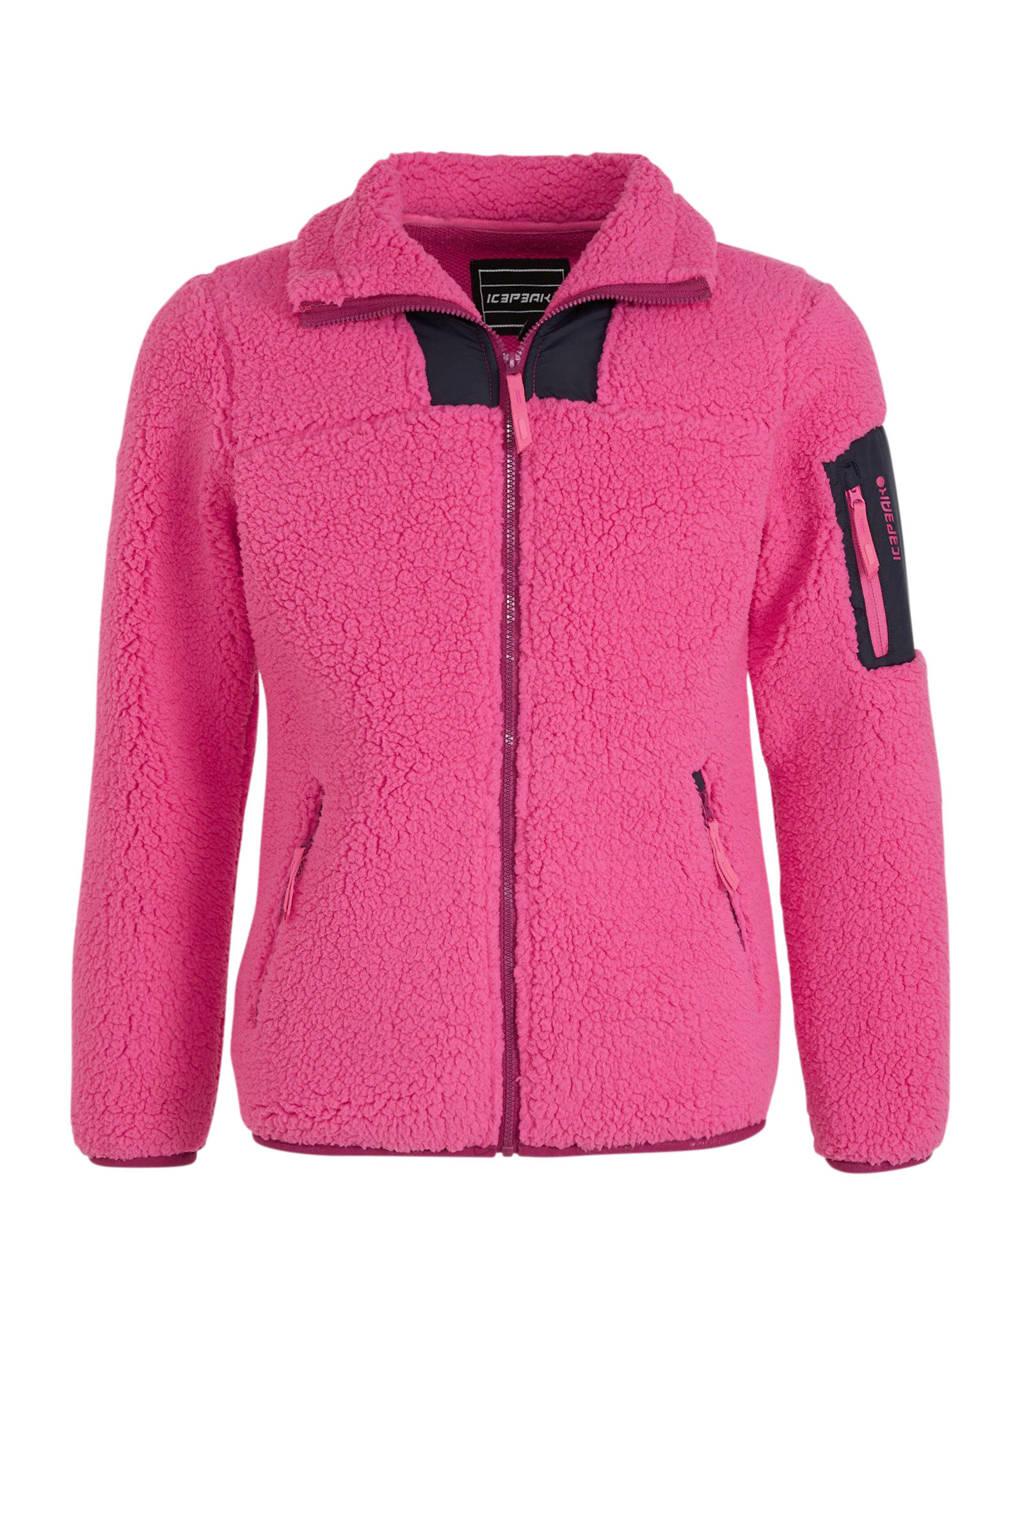 Icepeak vest Kennebec Jr. roze, Roze